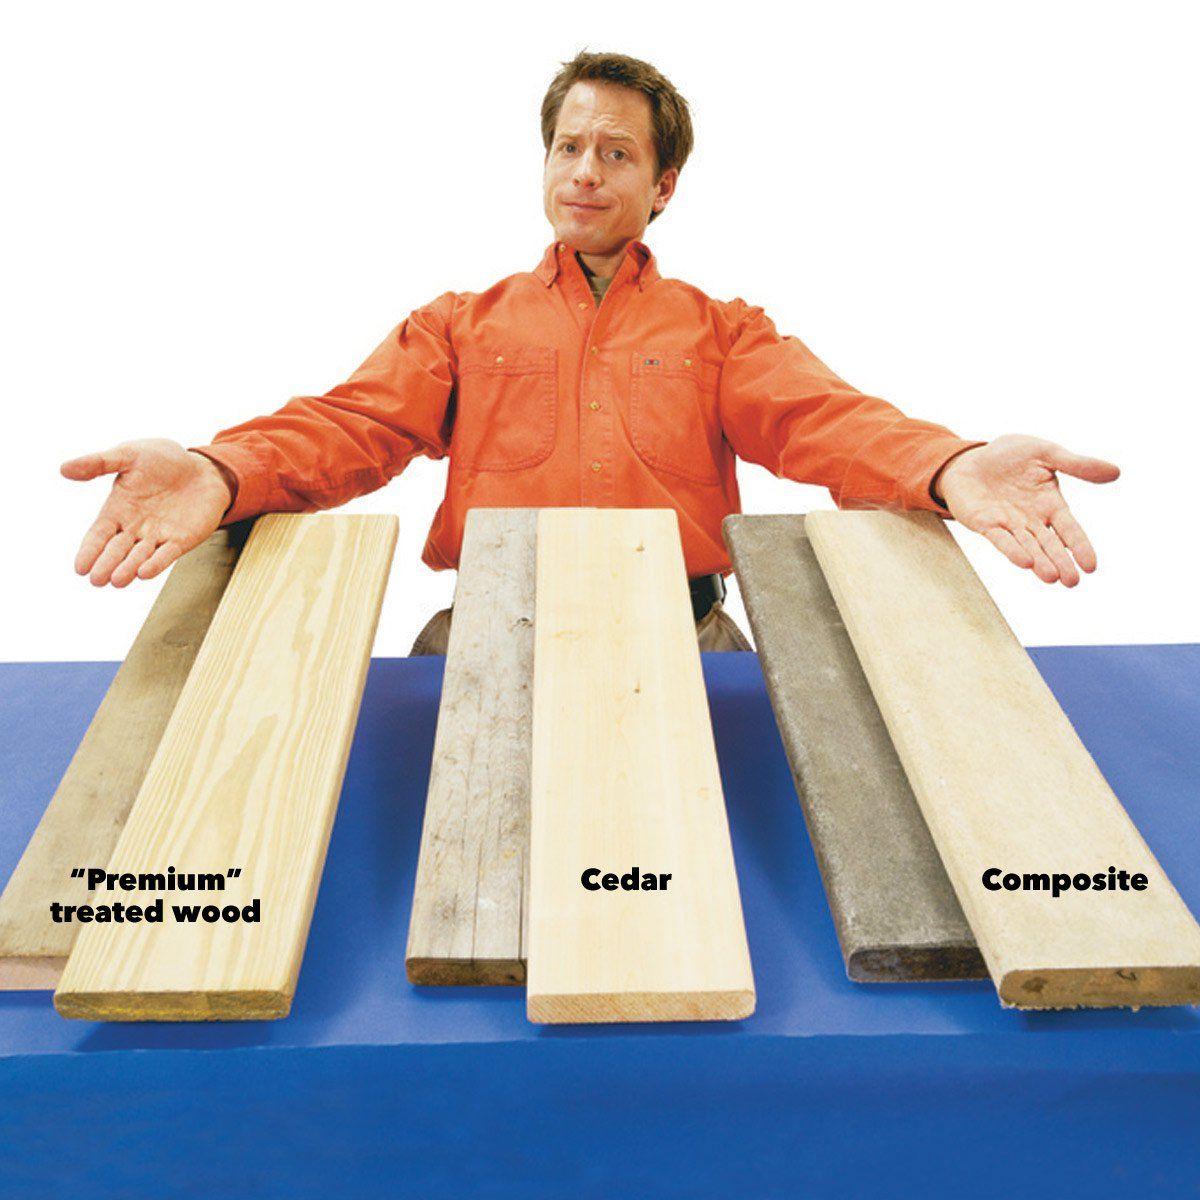 Comparing Wood Deck Options Cedar Pressure Treated Wood Composite Decking Wood Deck Composite Wood Deck Treated Wood Deck